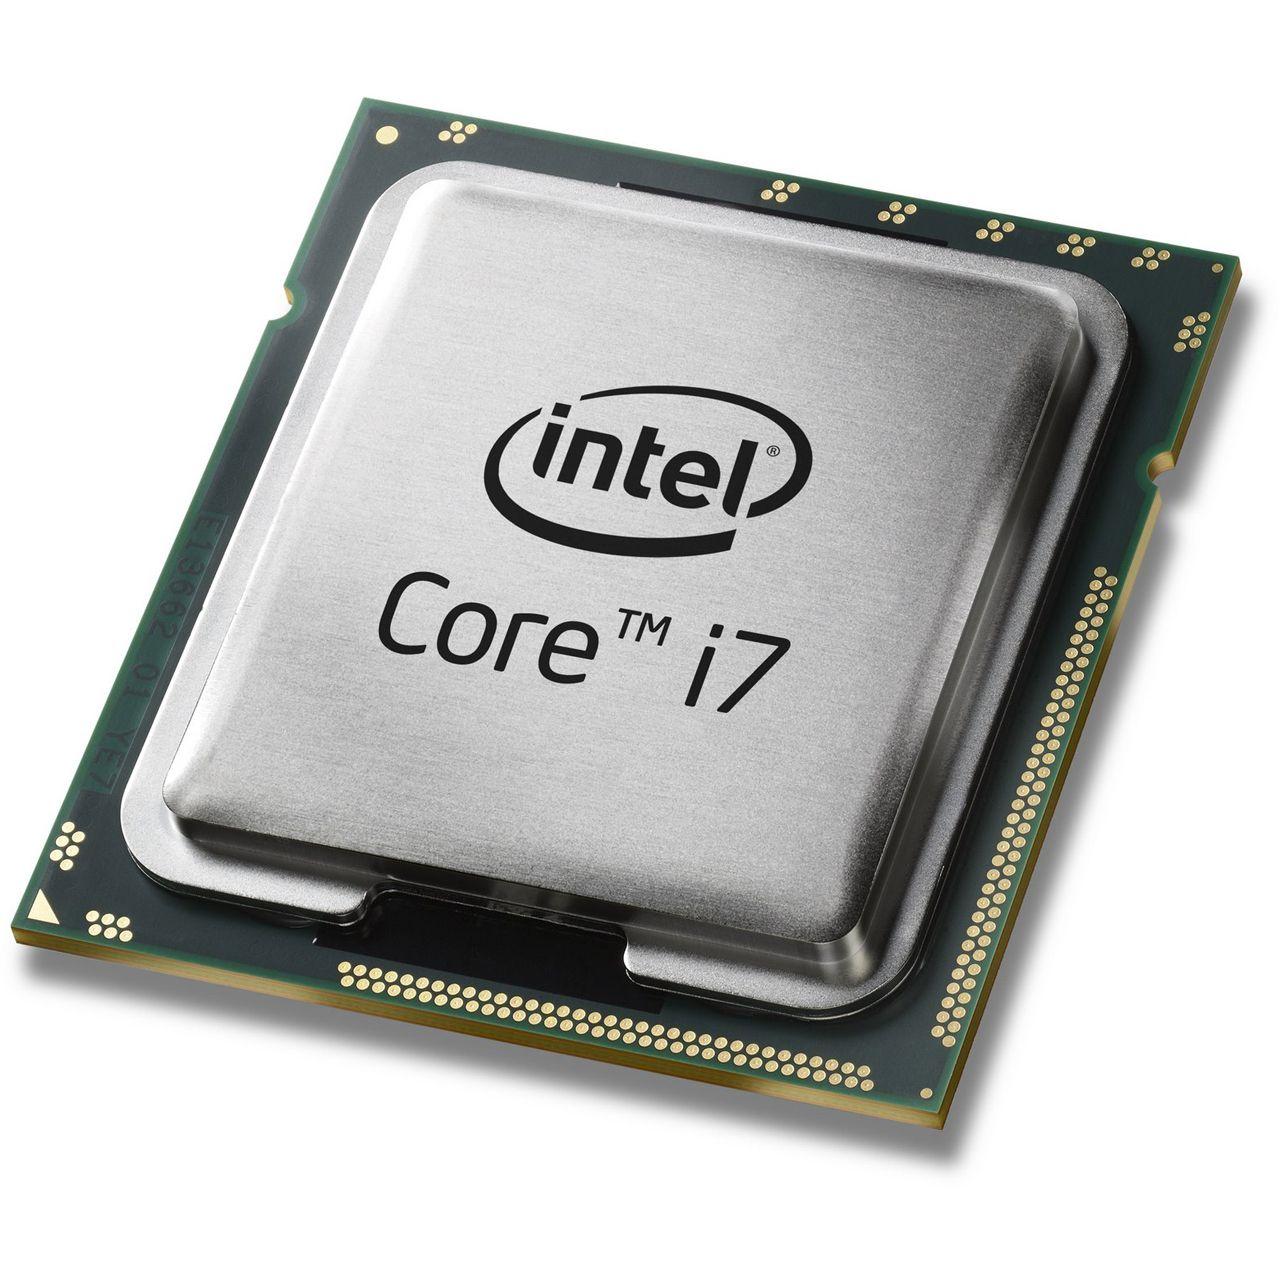 Atemberaubend Prozessor Fortsetzen Fotos - Entry Level Resume ...